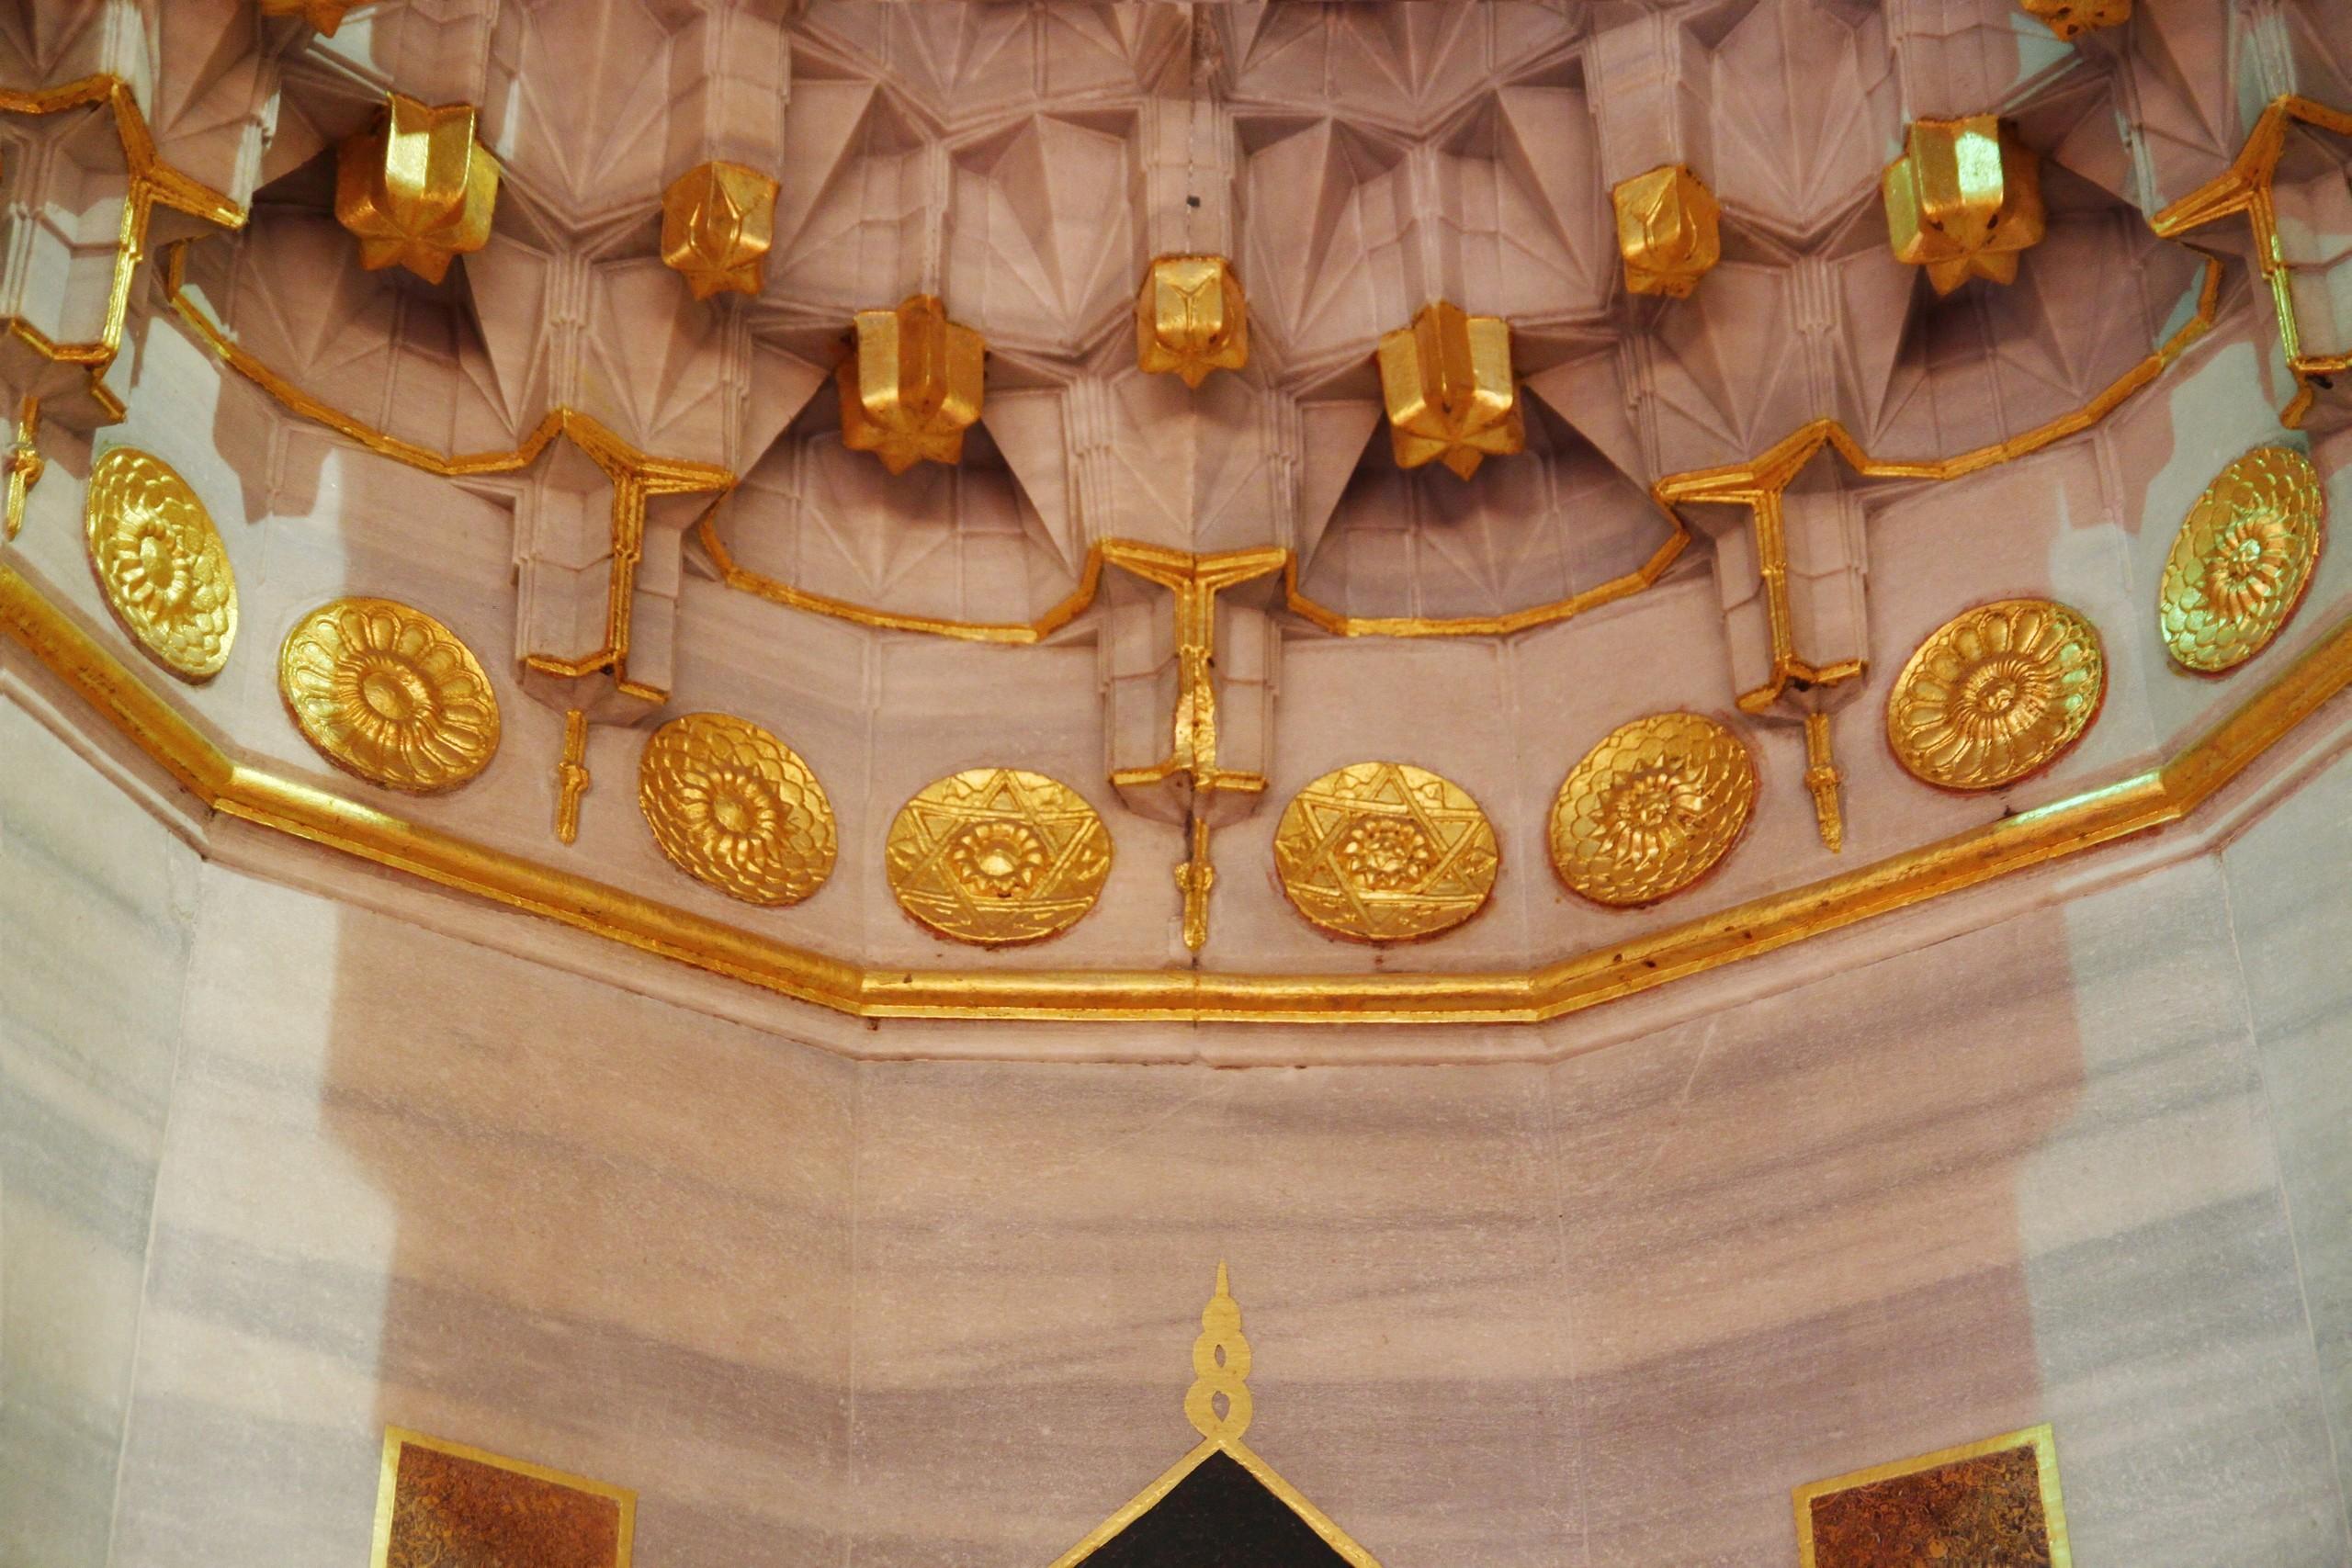 Pırlantadan Kubbeler #5: Sultanahmed - 0DWJYB - Pırlantadan Kubbeler #5: Sultanahmed